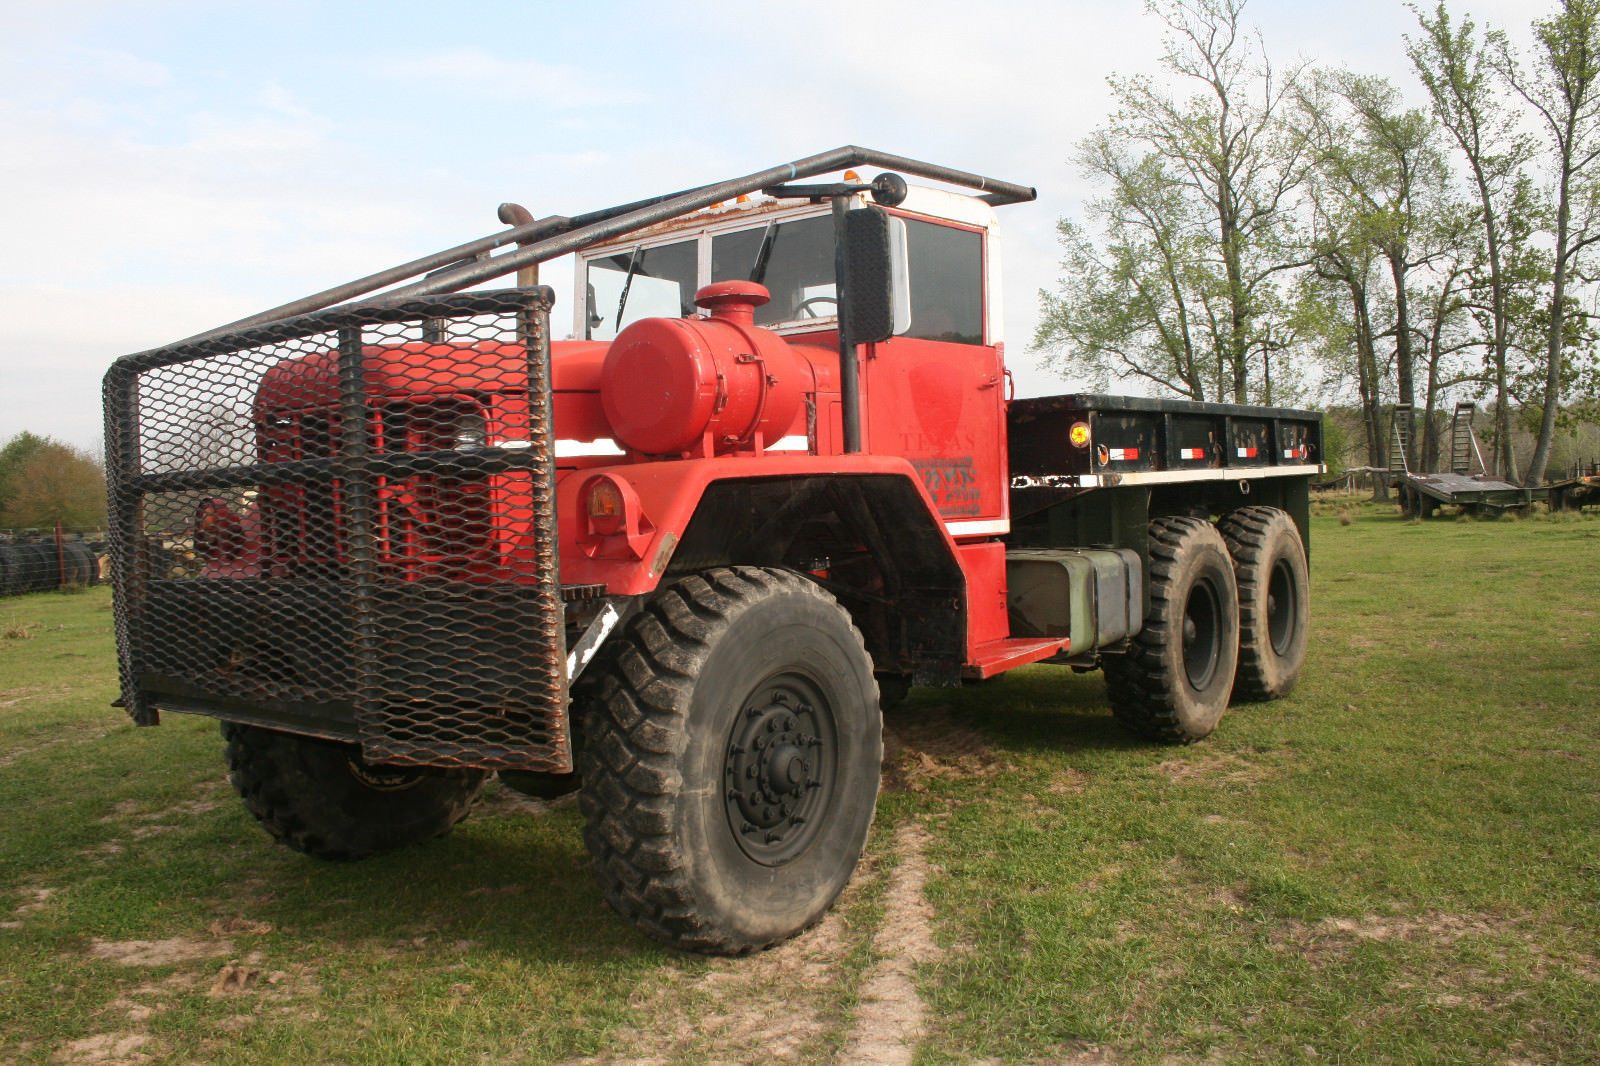 clean 1970 Kaiser M818 5TON Military 6X6 Cargo Truck for sale